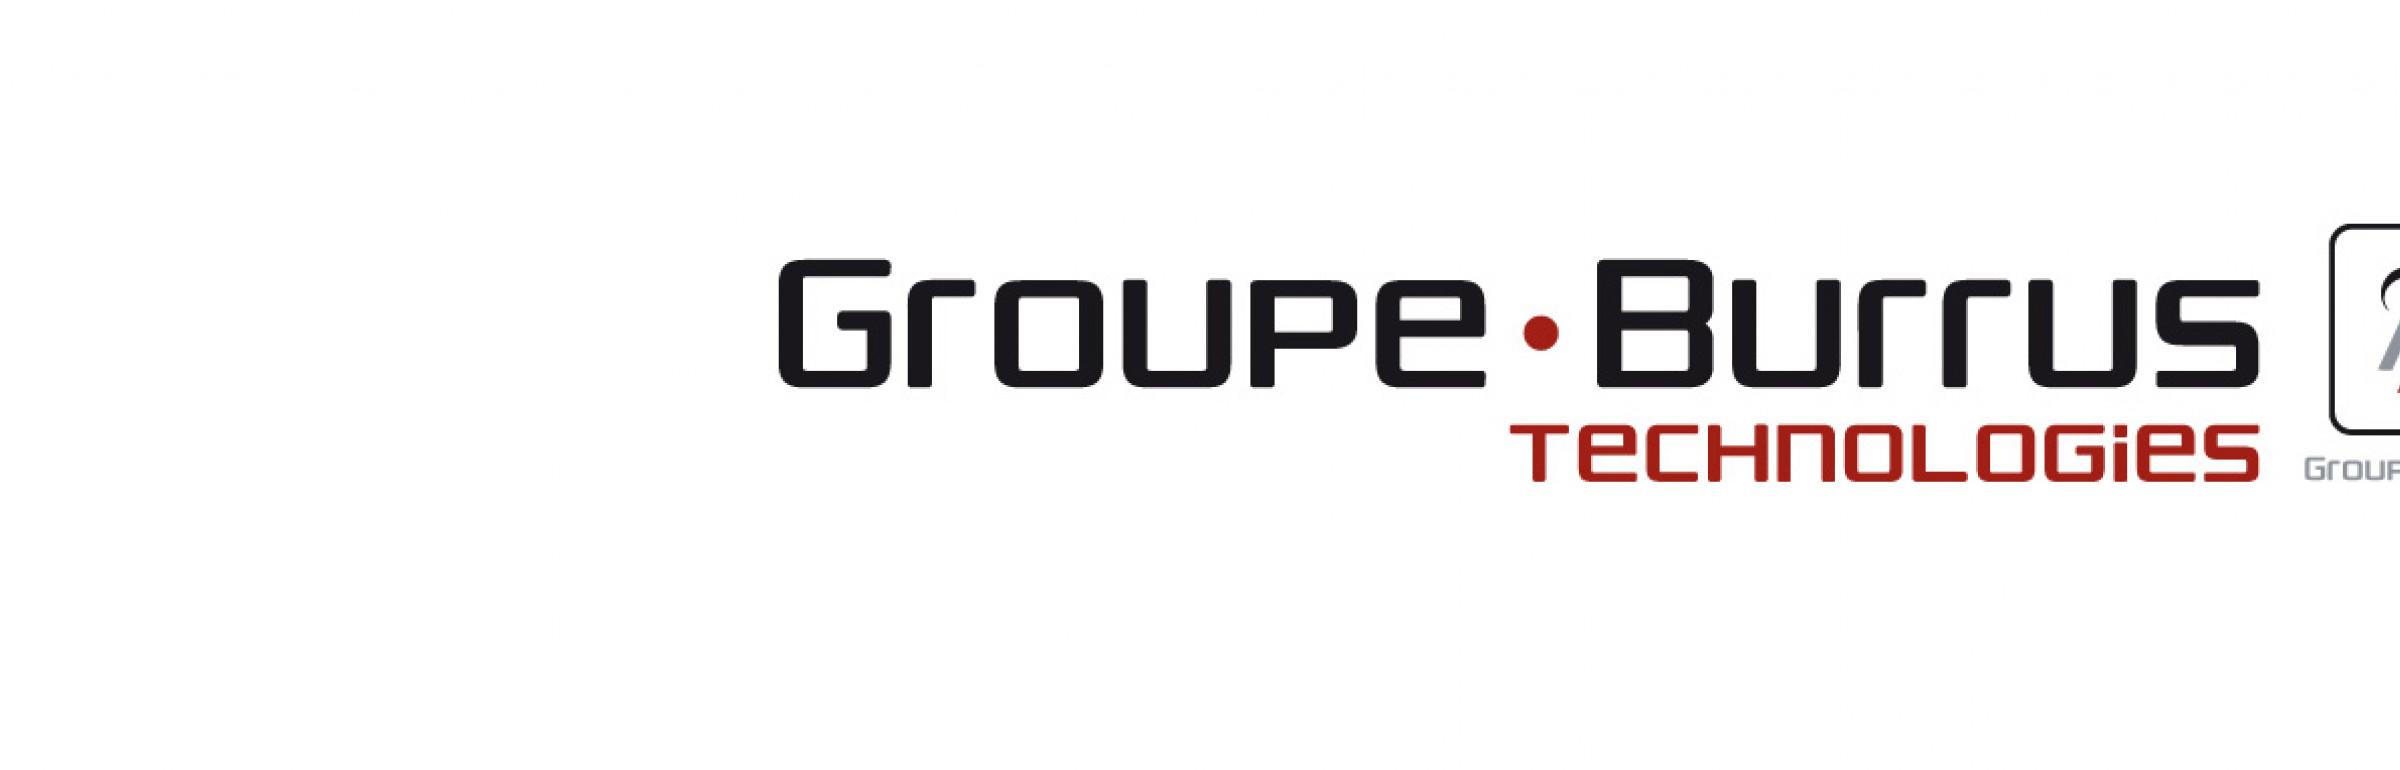 Banner Groupe Burrus Technologies